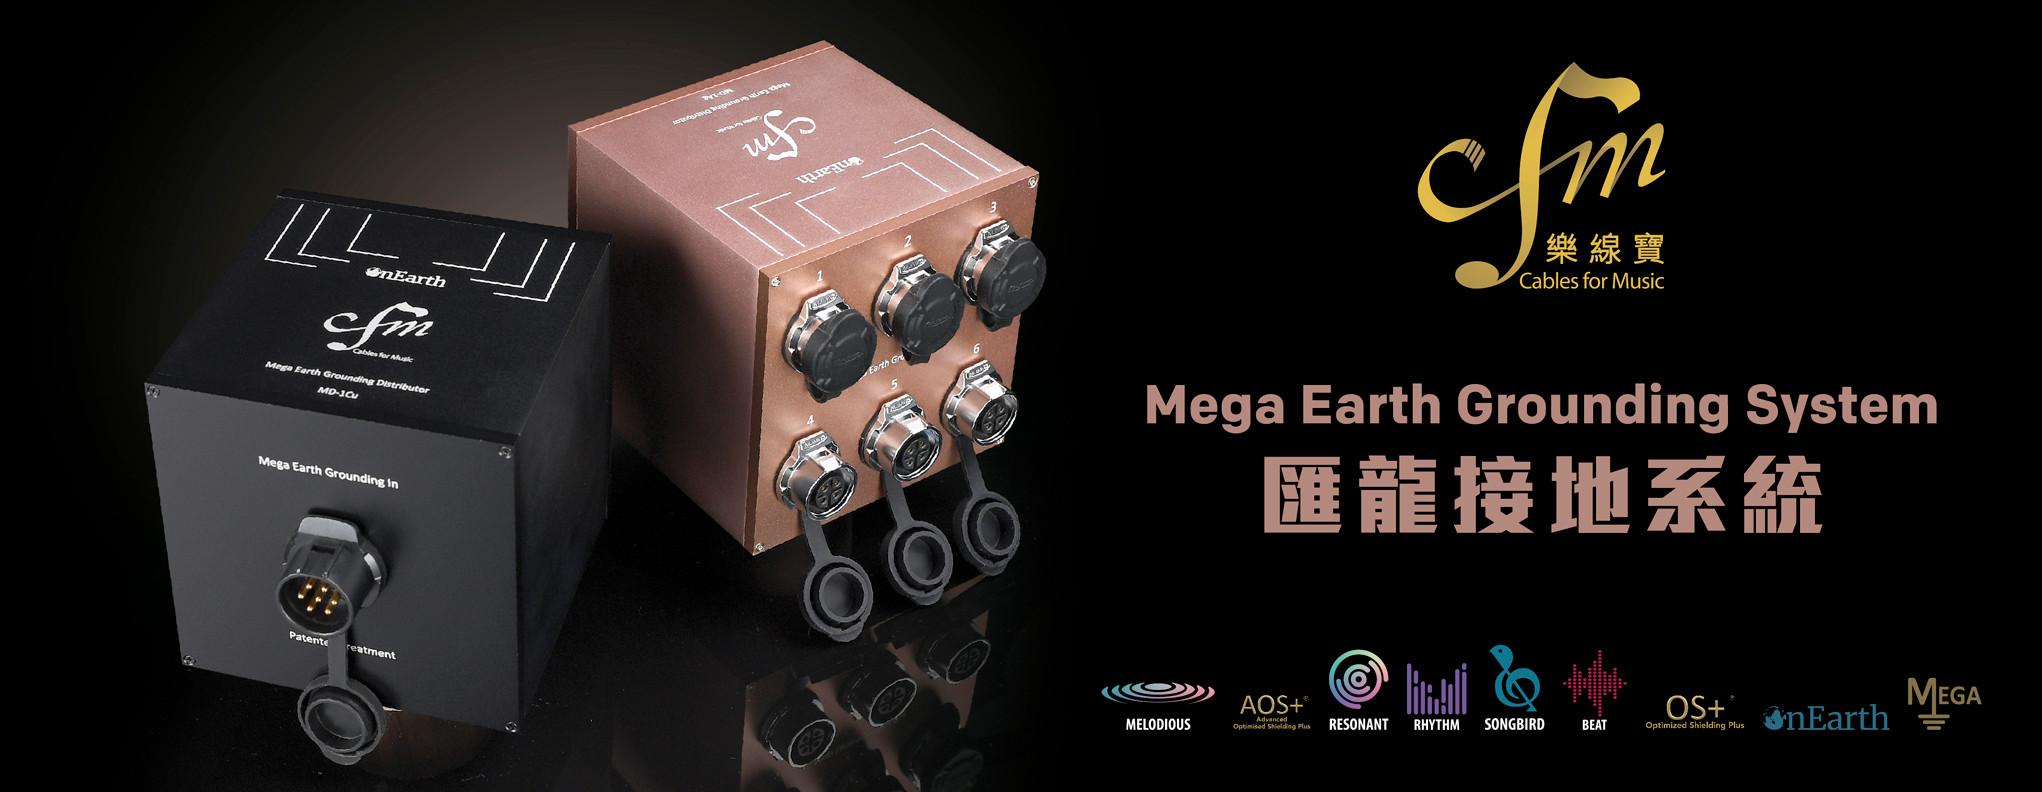 CFM.mega-2042x792-01.jpg